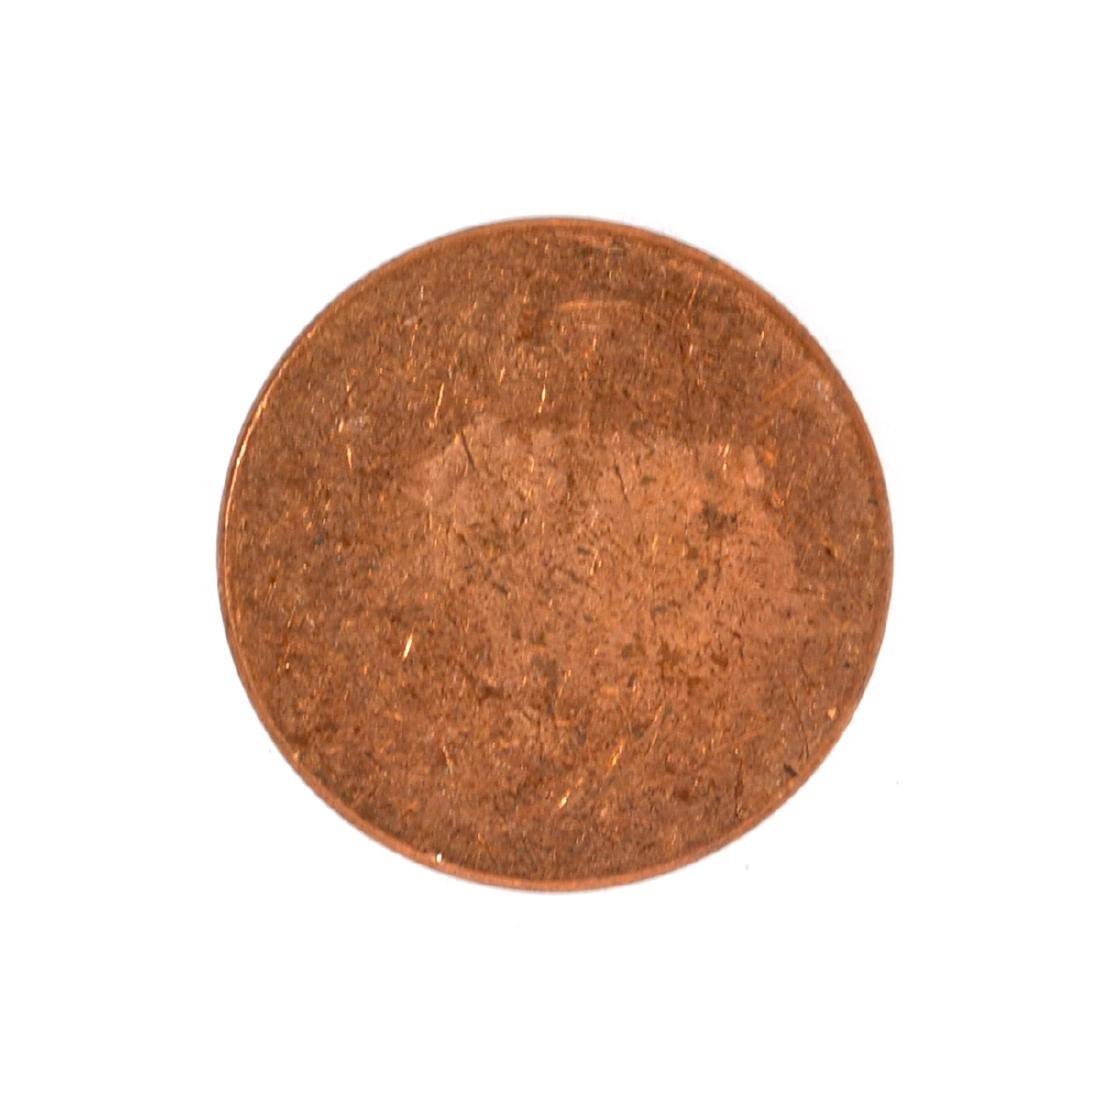 Mint U.S. 1 Cent Blank Planchet Coin - 2